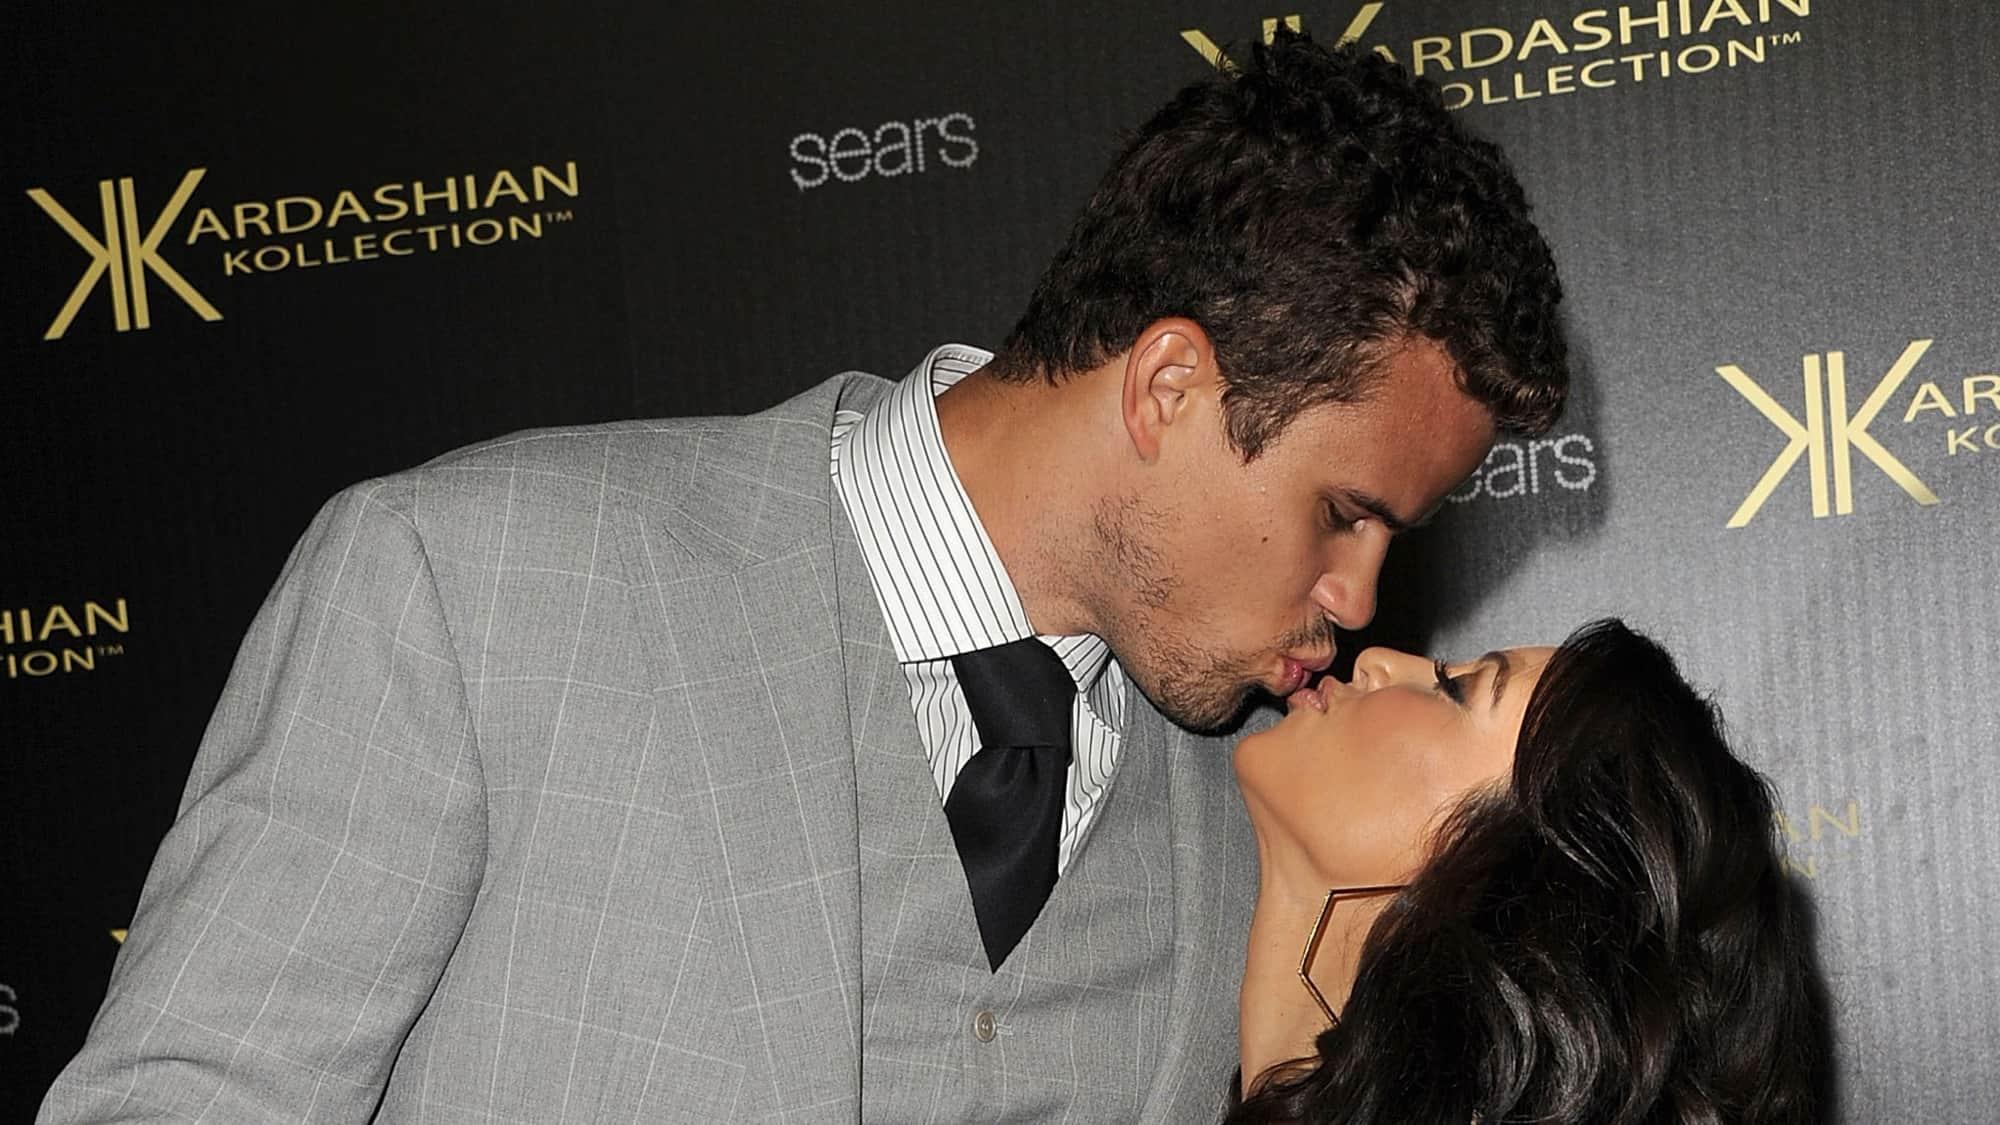 Kris Humphries and Kim Kardashian Kardashian Kollection Launch Party